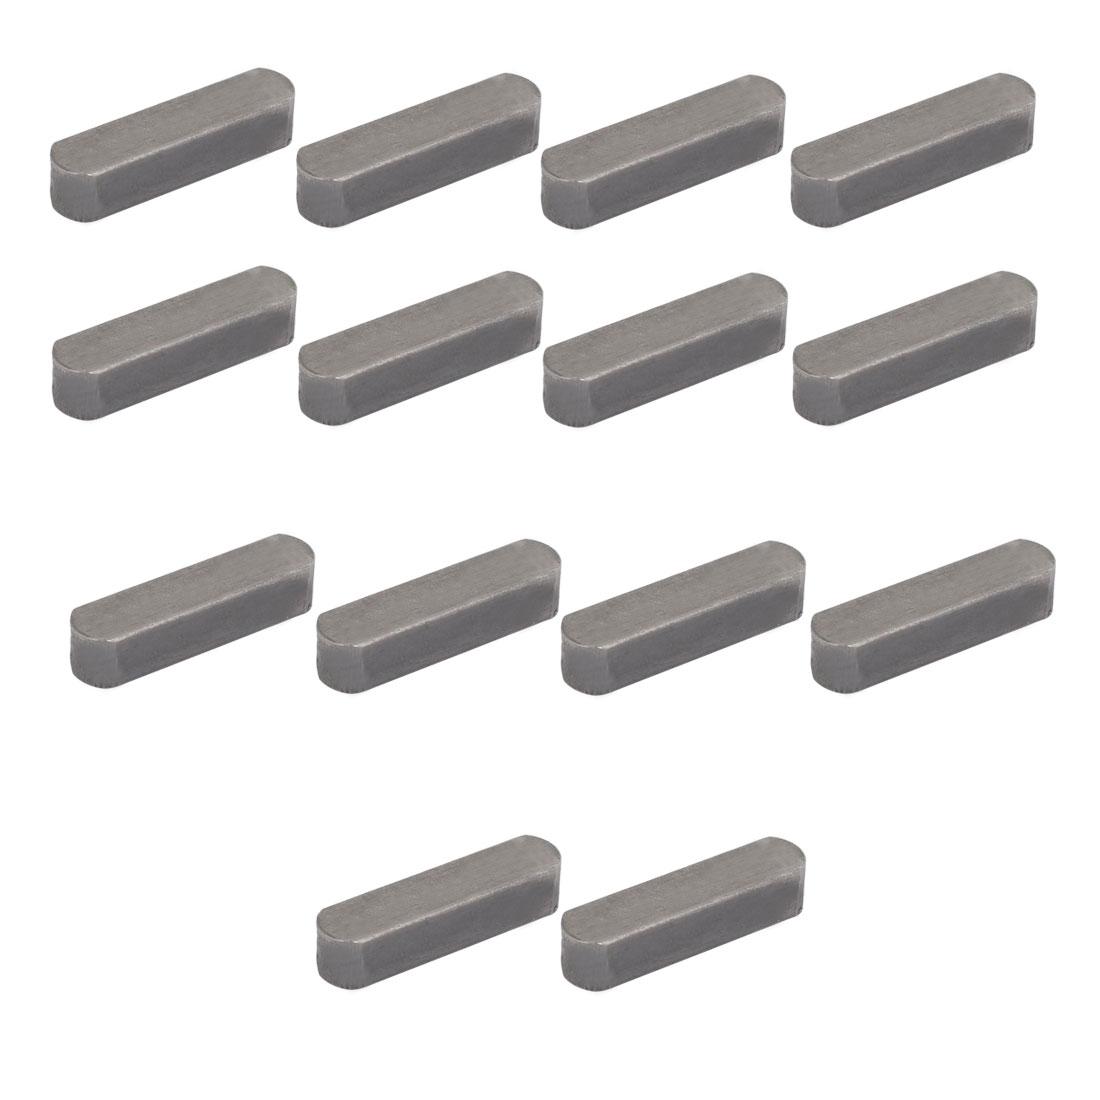 32mmx8mmx7mm Carbon Steel Key Stock To Lock Pulleys 14pcs